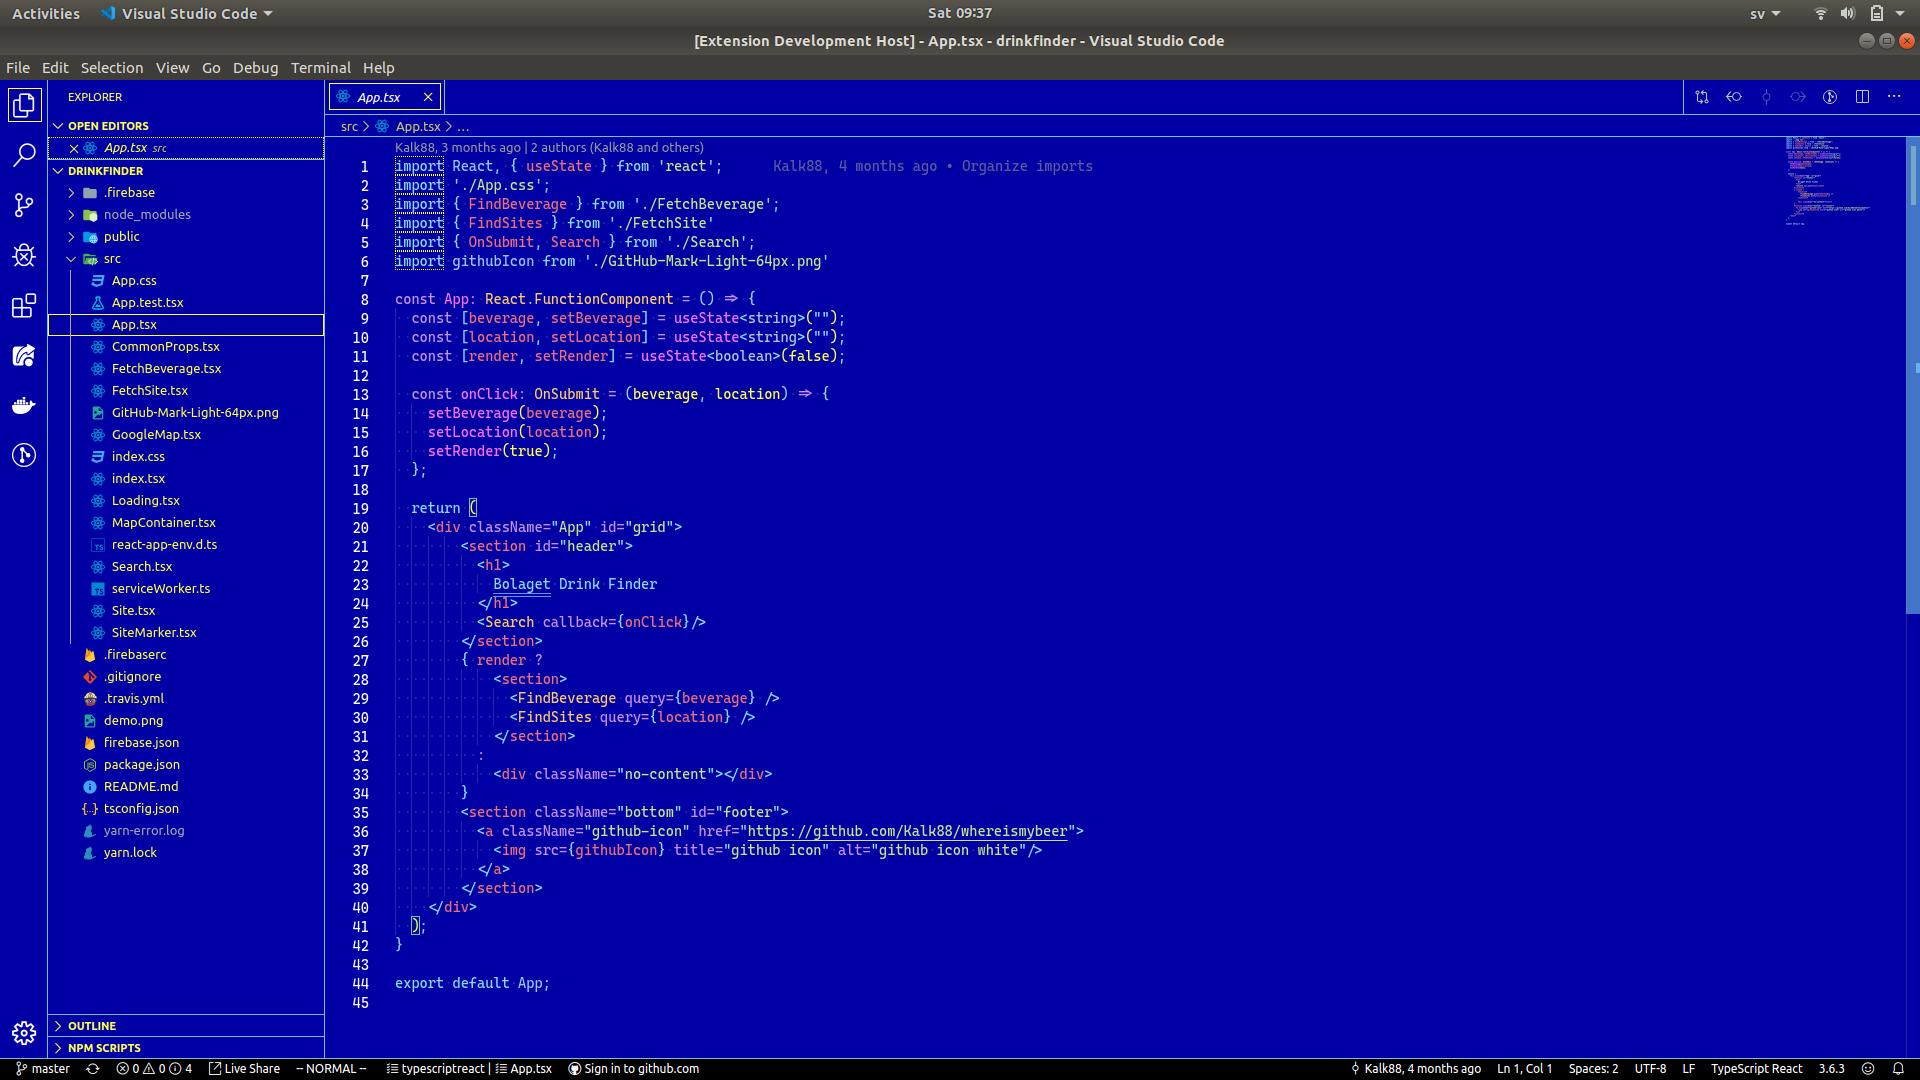 theme-screenshot